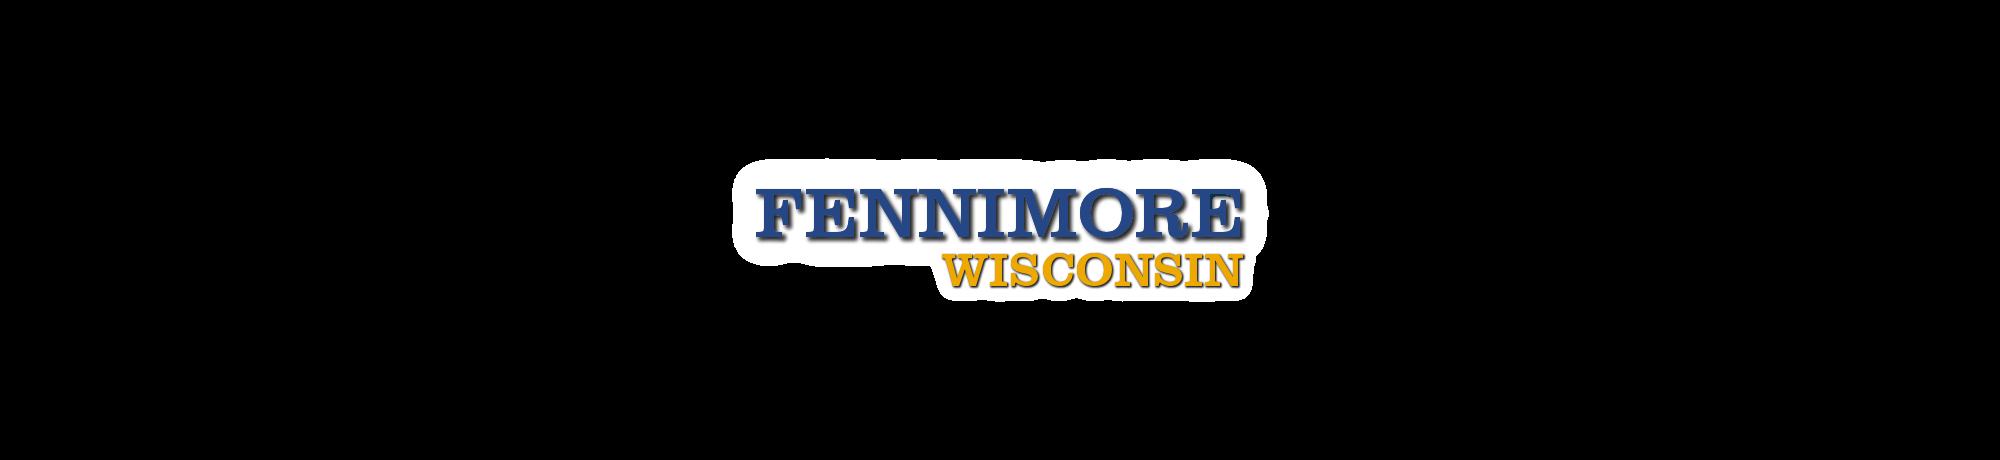 Fennimore Wisconsin